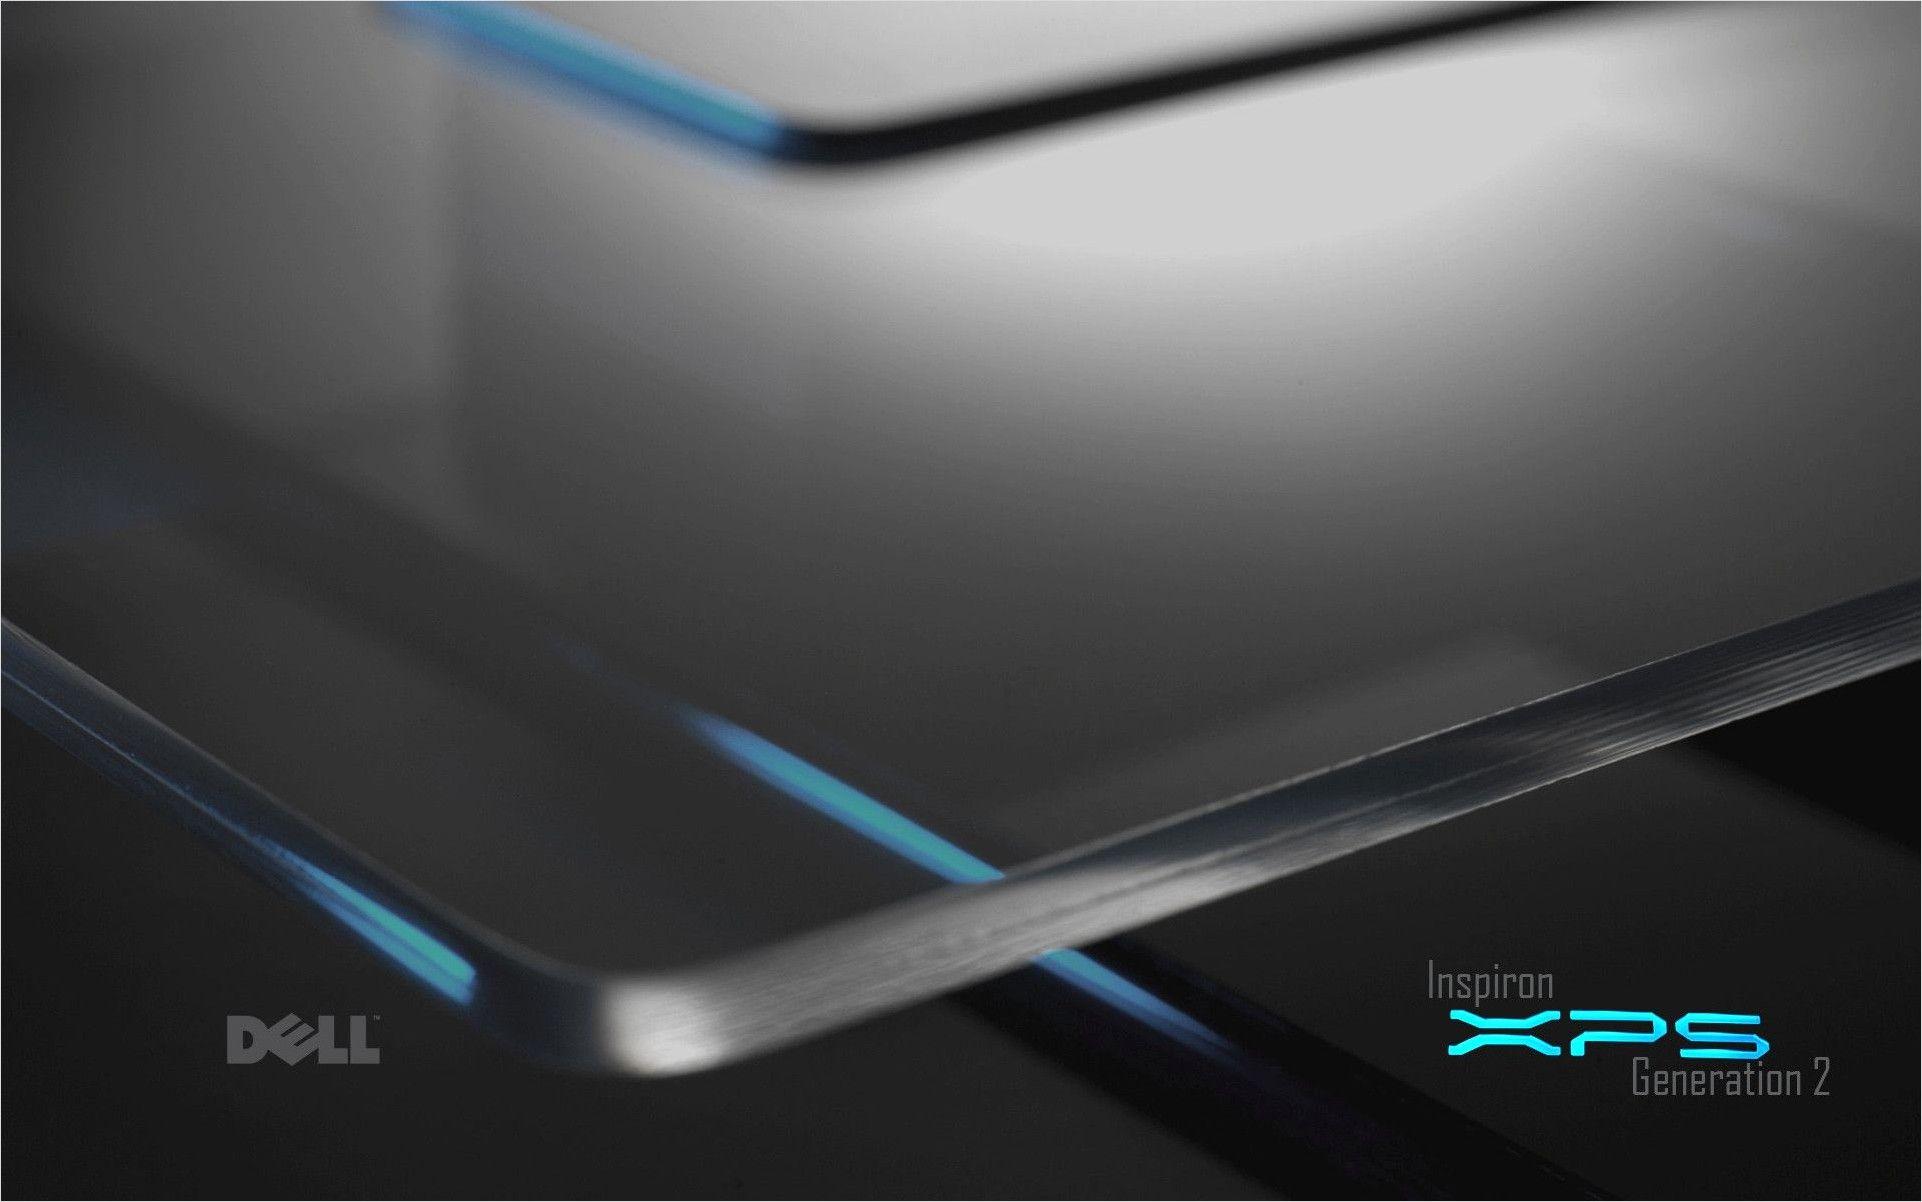 Dell Xps 15 Wallpaper 4k In 2020 Dell Xps Hd Wallpaper Desktop Themes